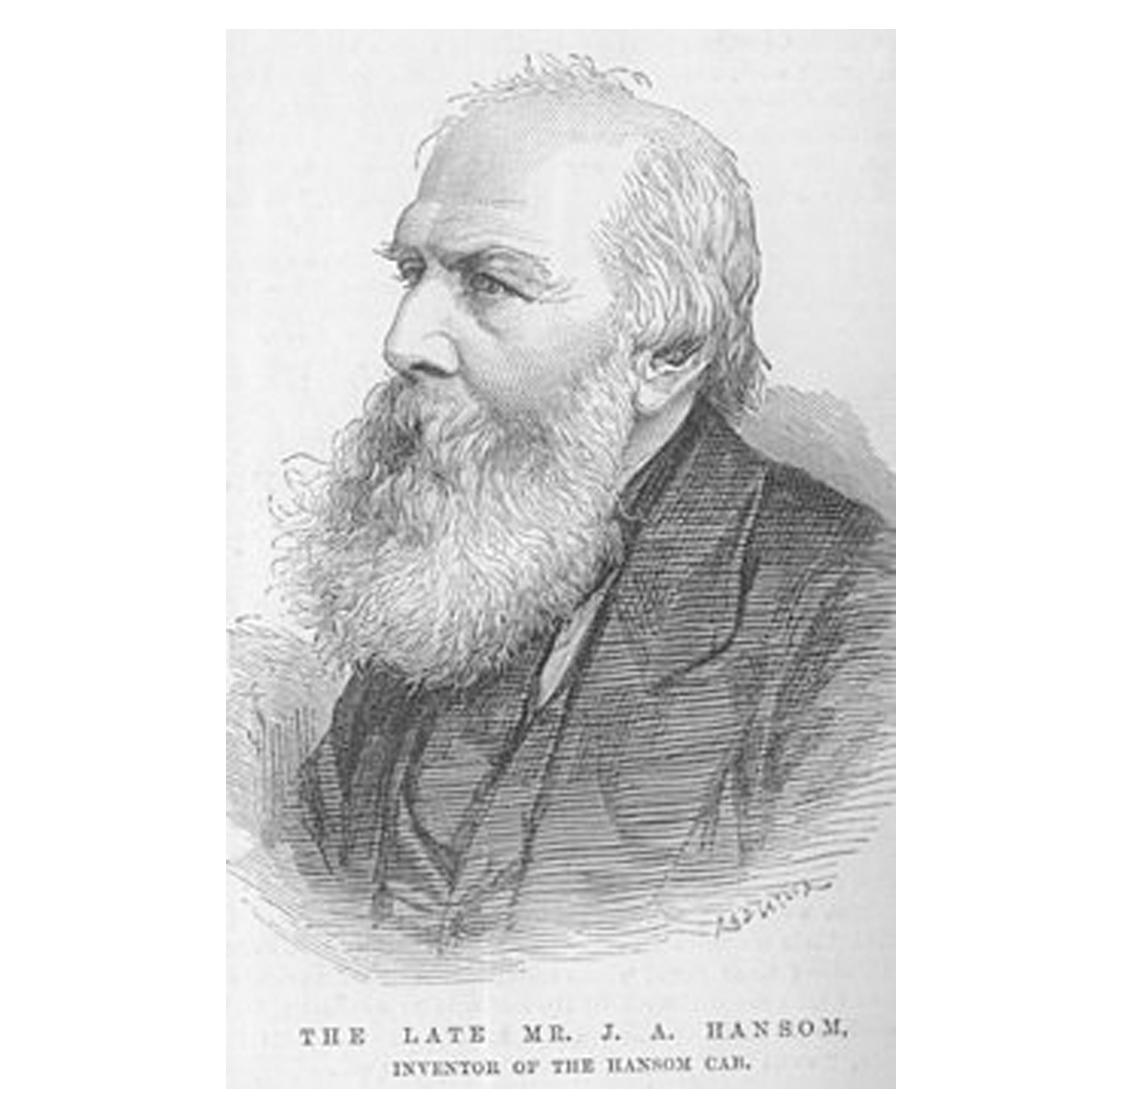 Joseph Hansom (1803-82), architect & inventor of the Hansom Cab.